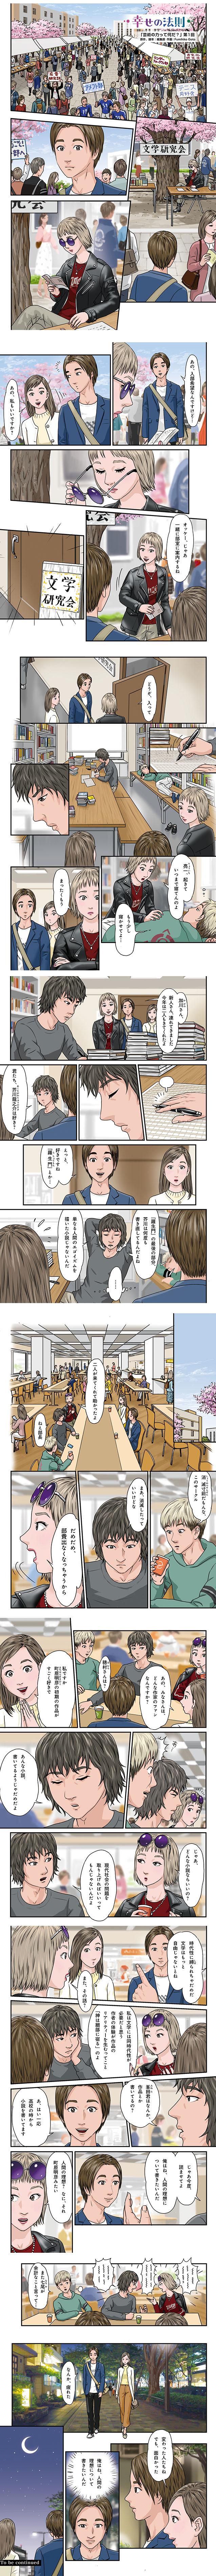 hidokei130_manga_all